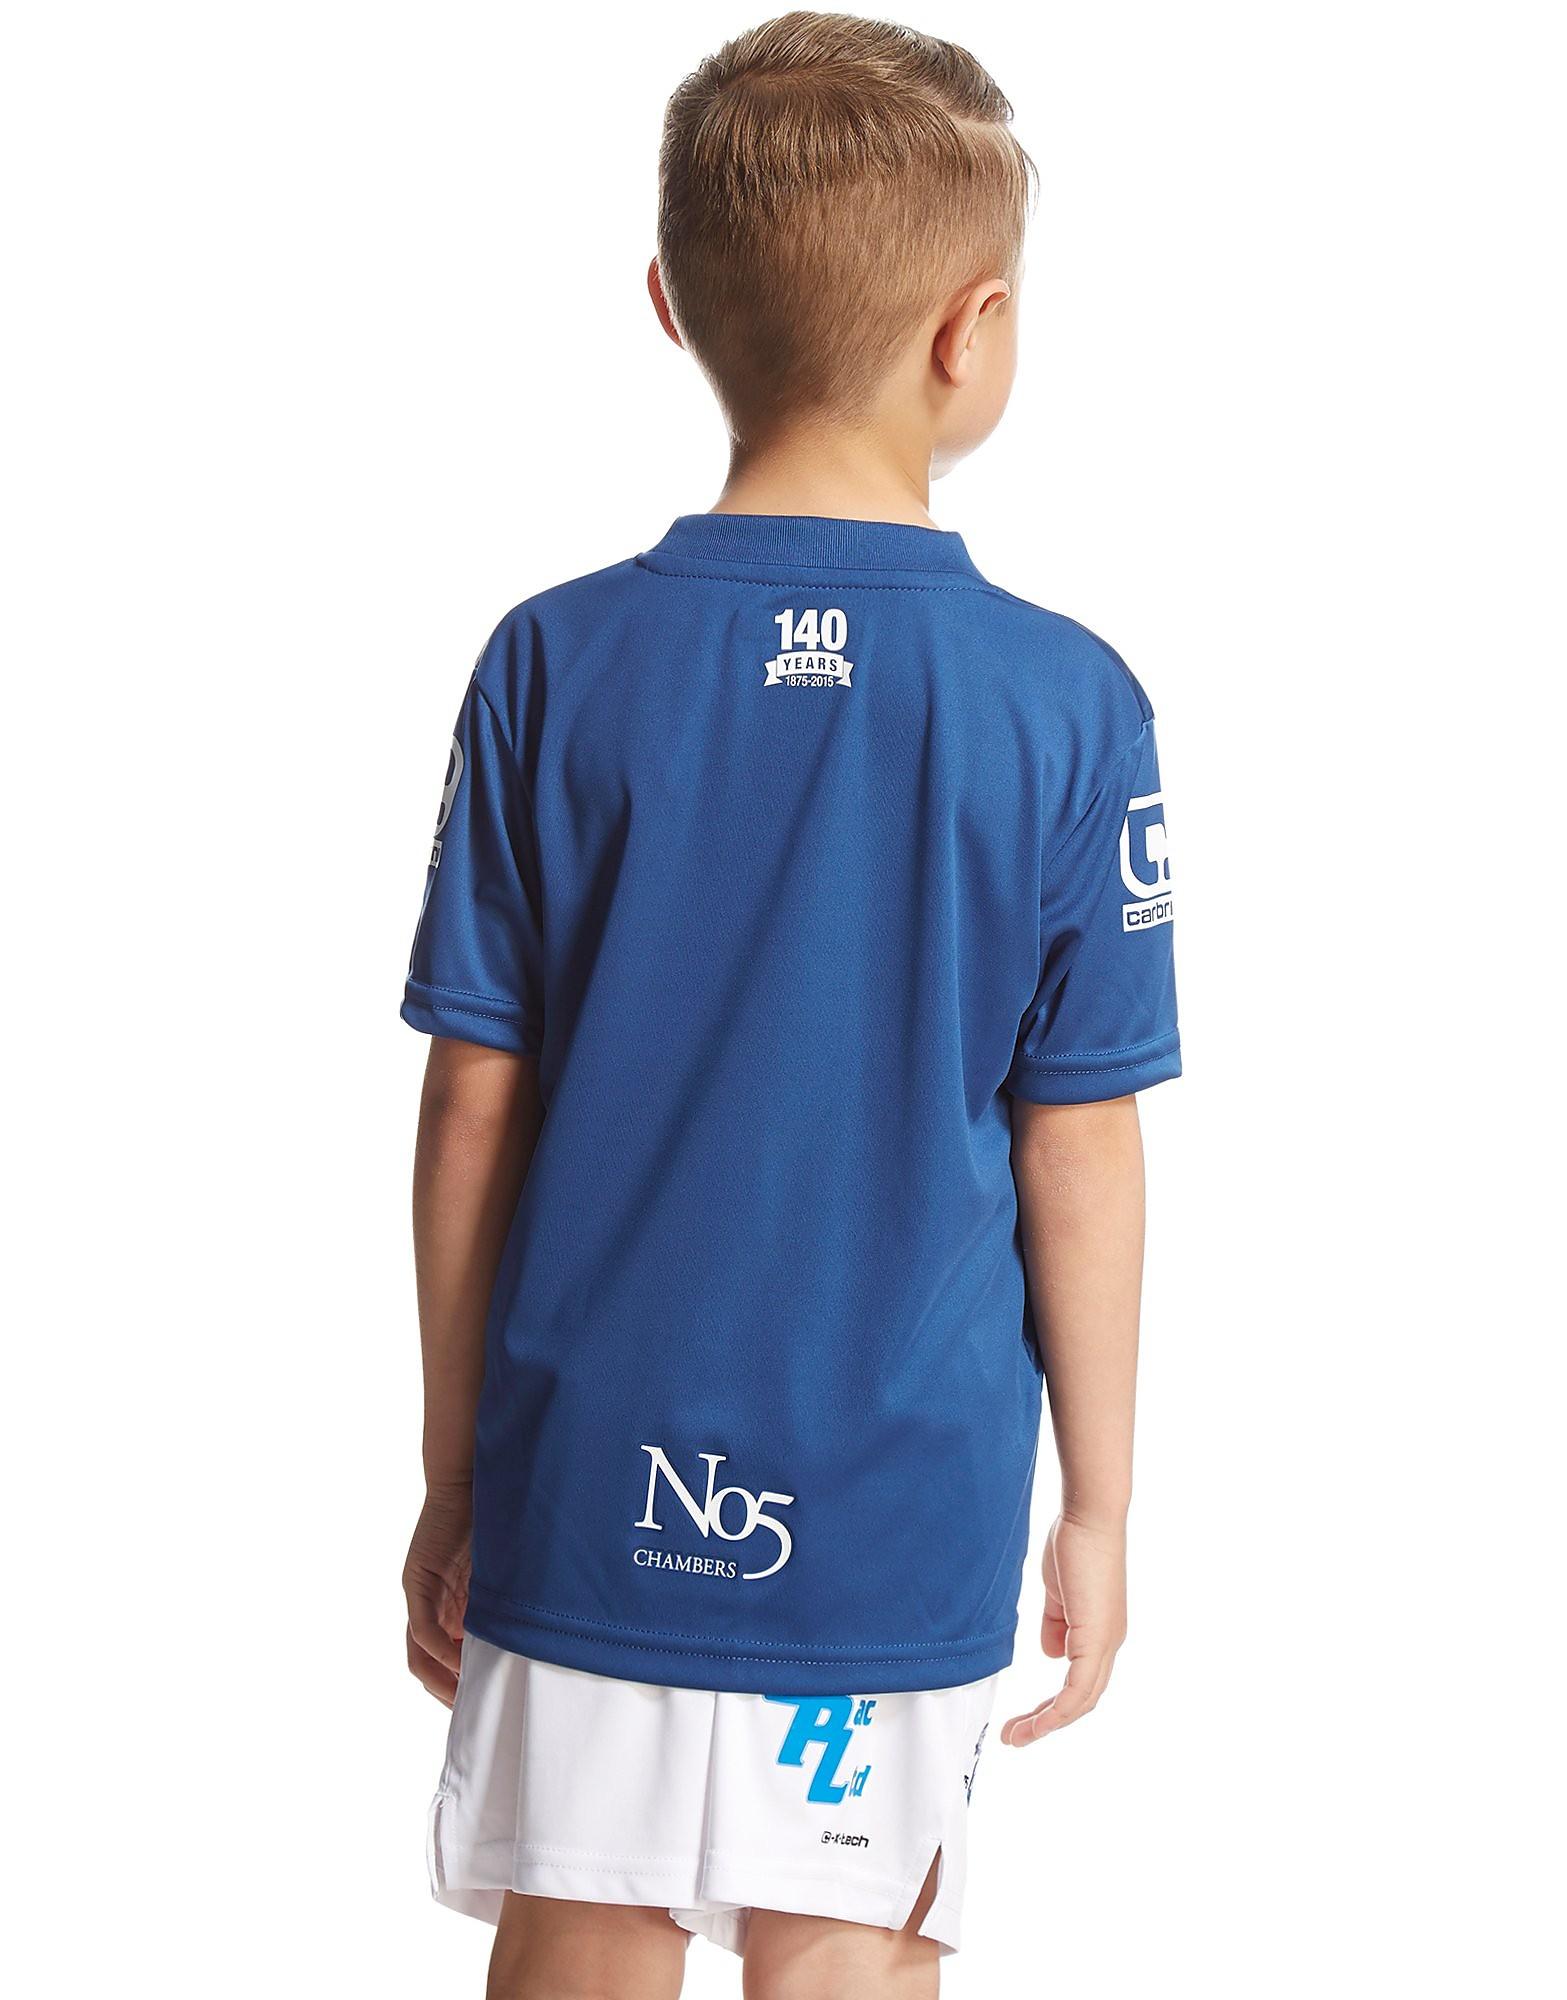 Carbrini Birmingham City FC 2015 Home Kit Children